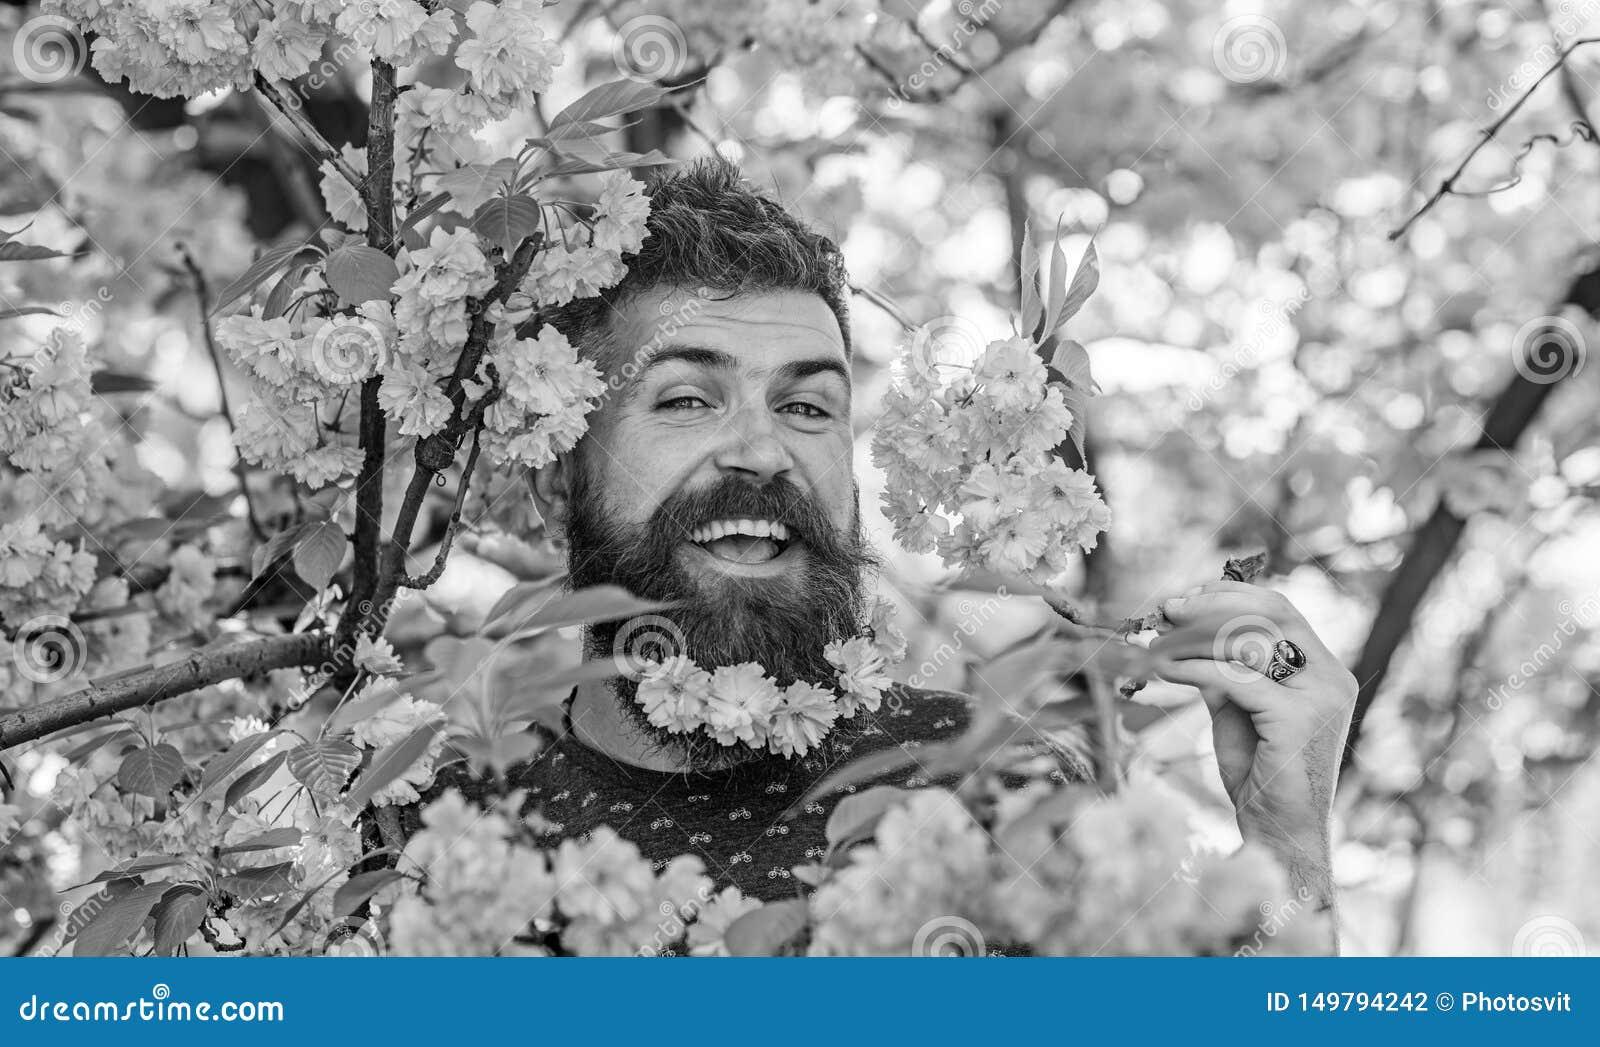 E   有胡子的在愉快的面孔的人和髭在嫩桃红色附近